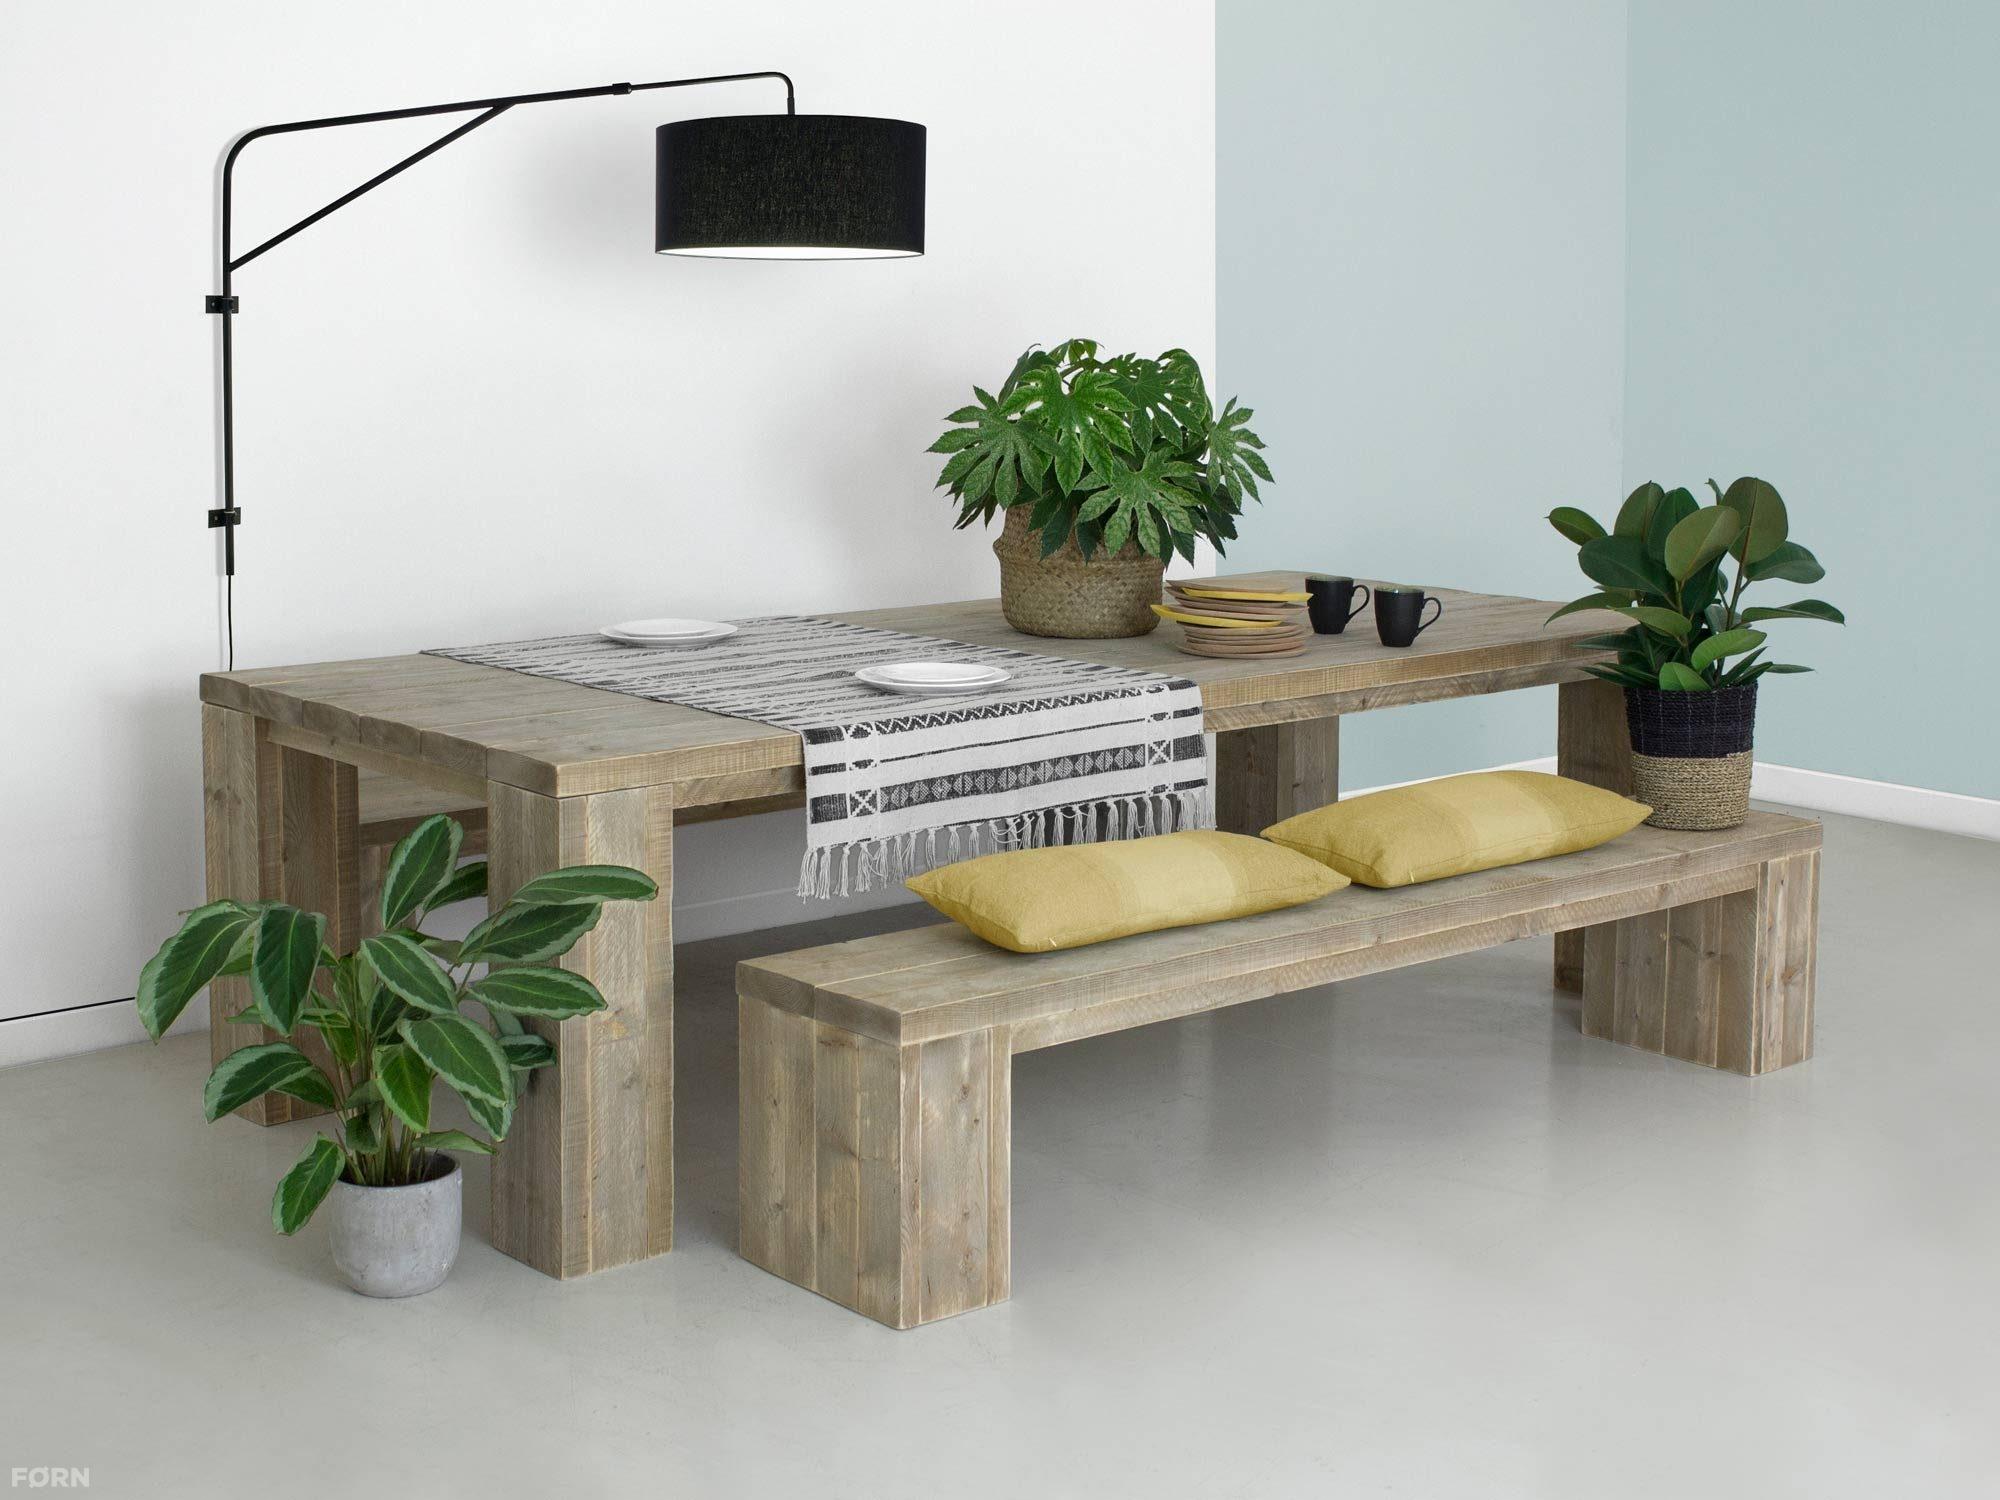 Dikke Planken Boekenkast.Steigerhouten Tafel Kollmar Met Dikke Planken Forn